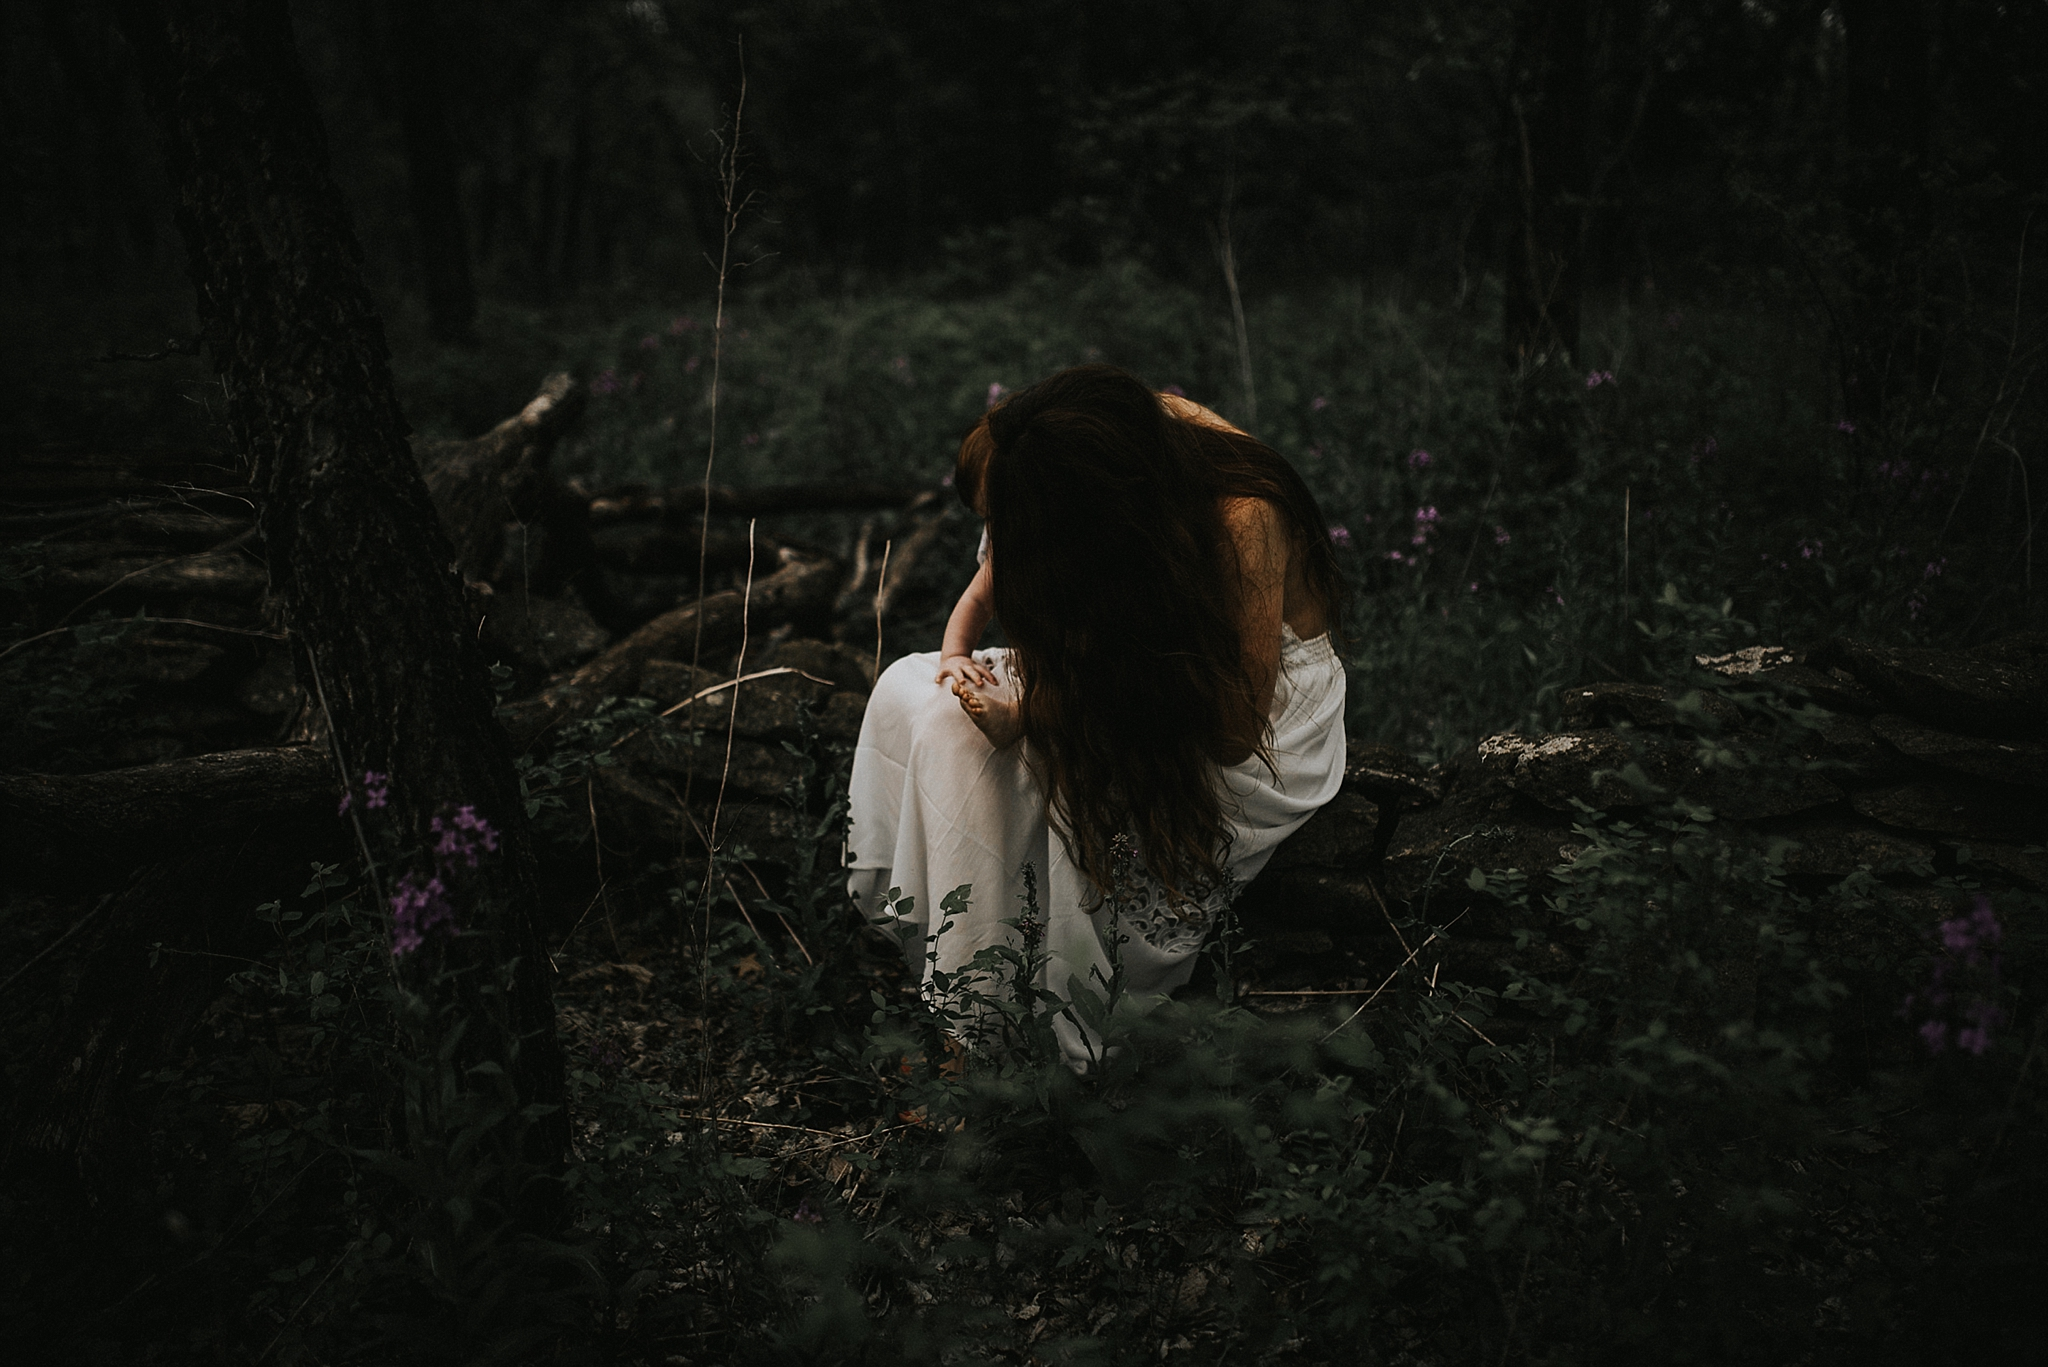 twyla jones photography - mother daughter - field and forest-4742_treasure coast florida.jpg